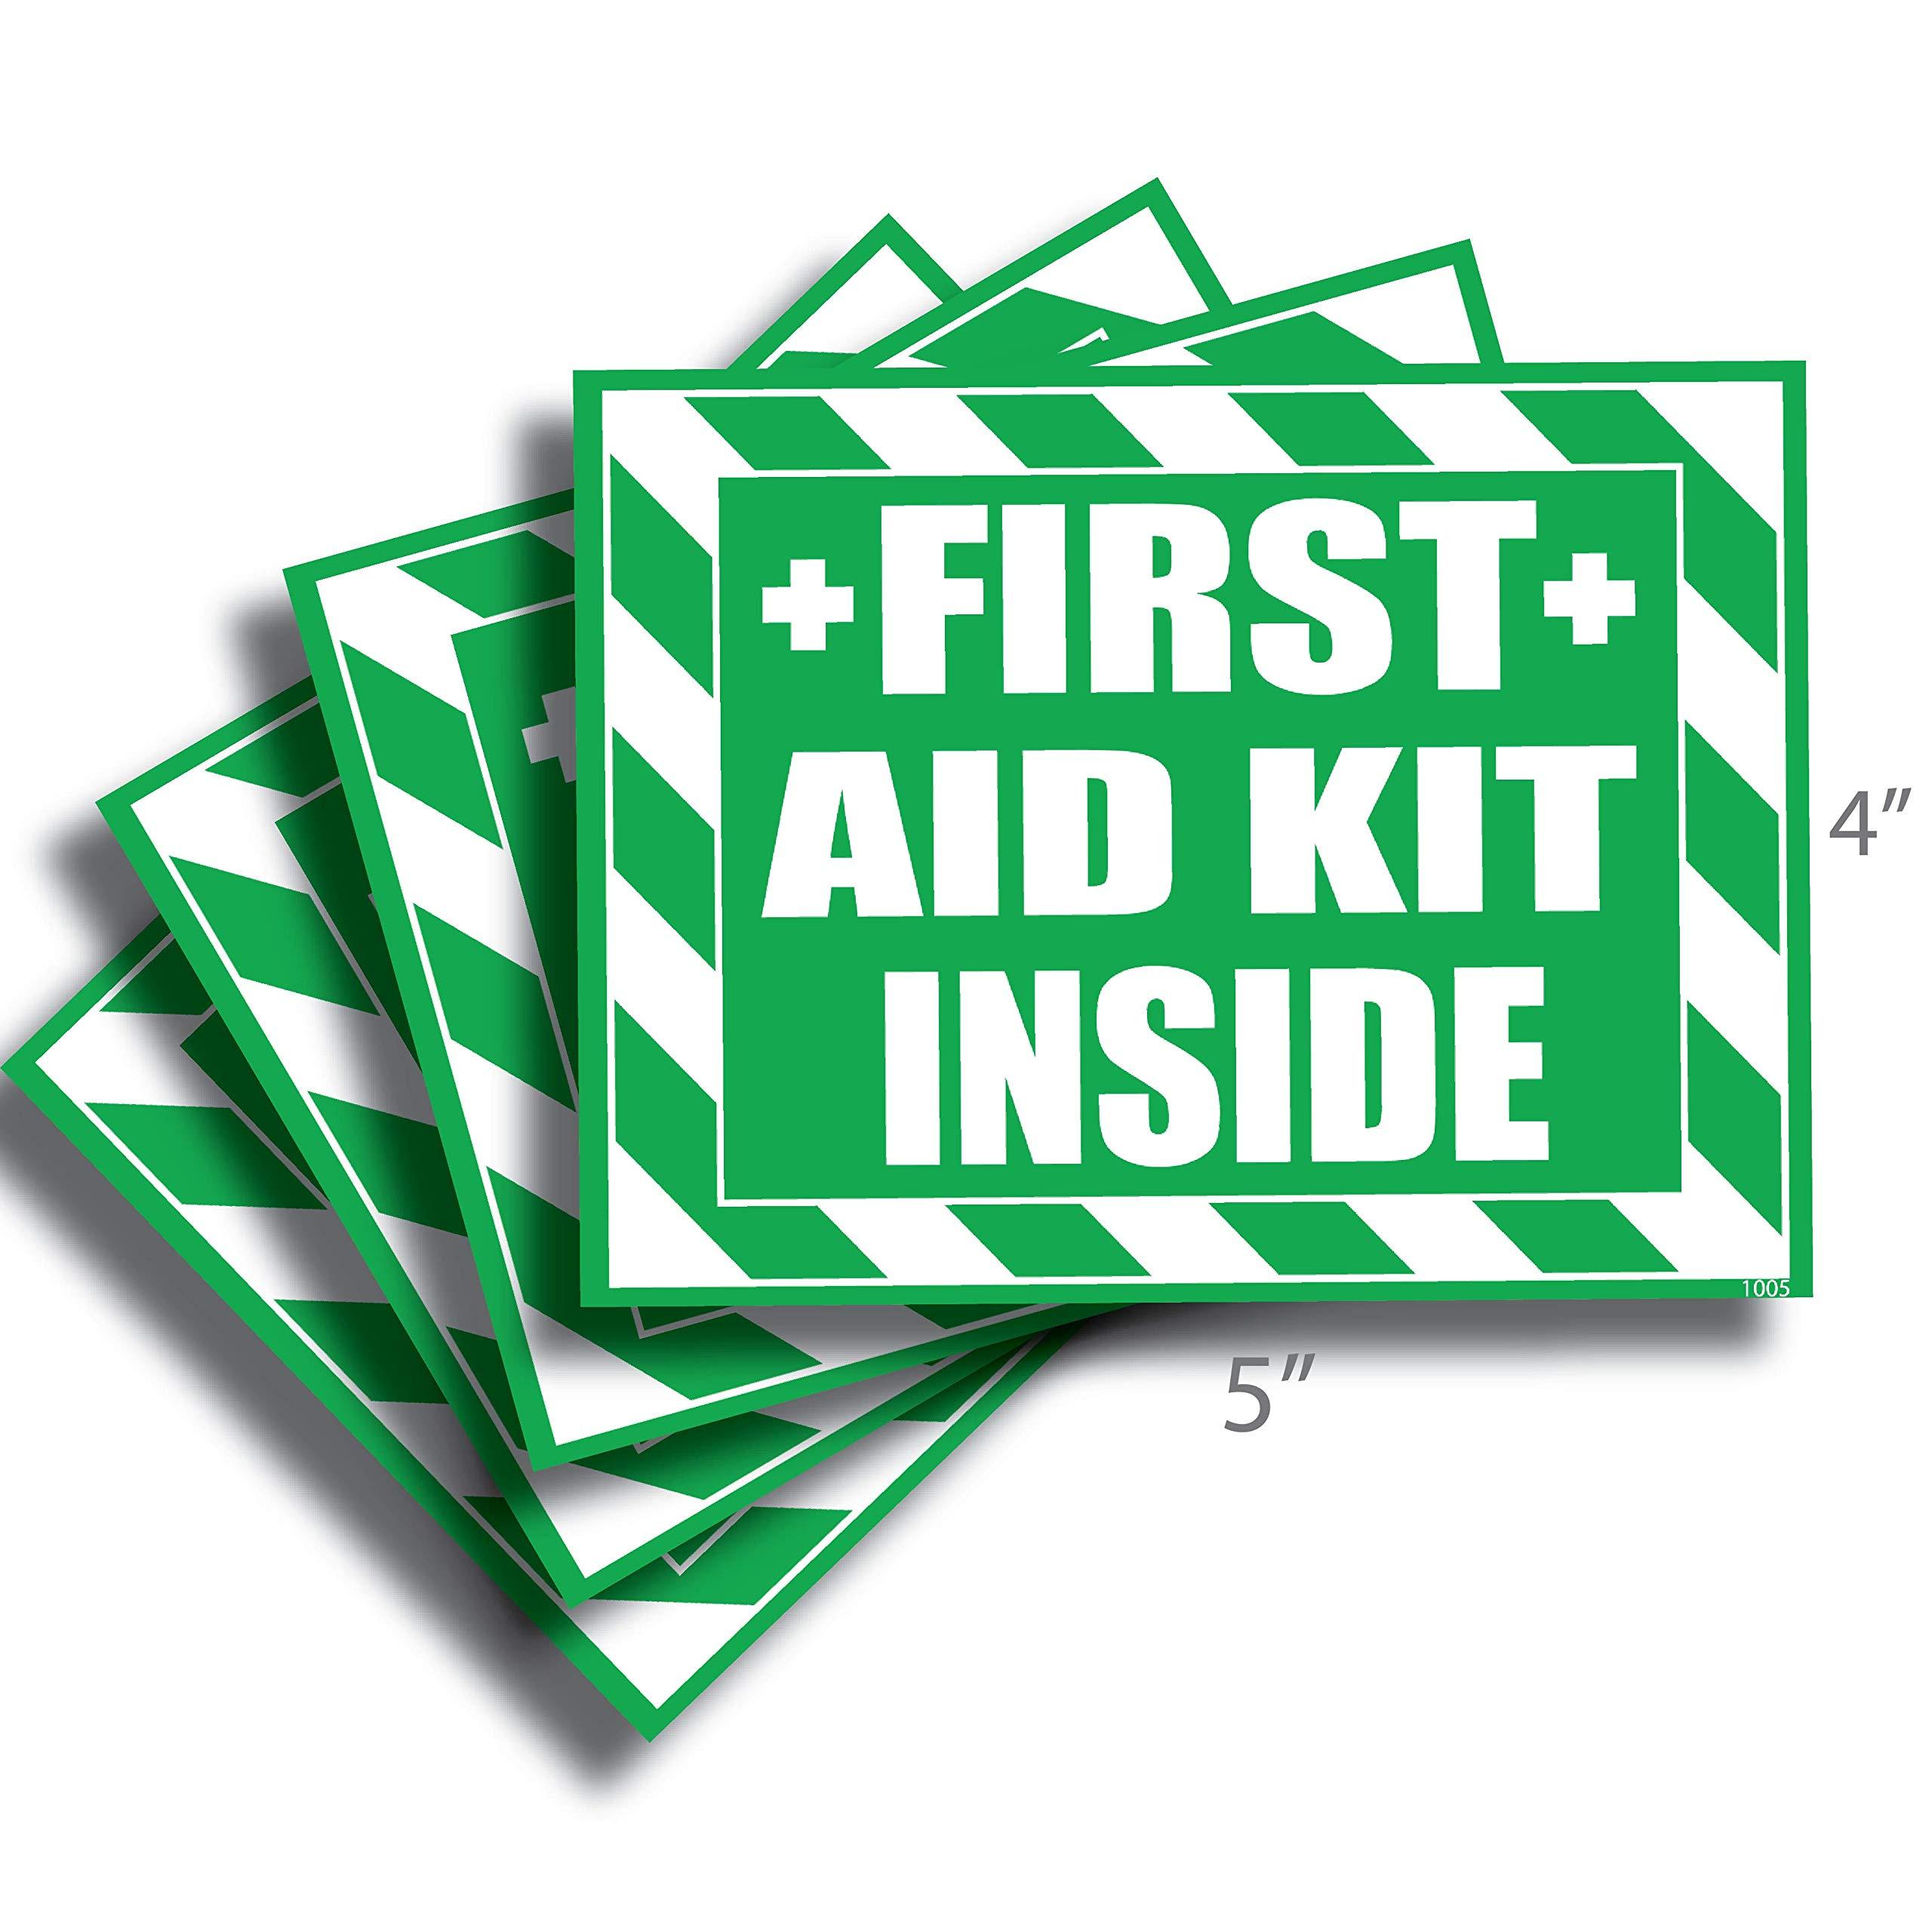 Inside Sticker Adhesive Industrial Equipment